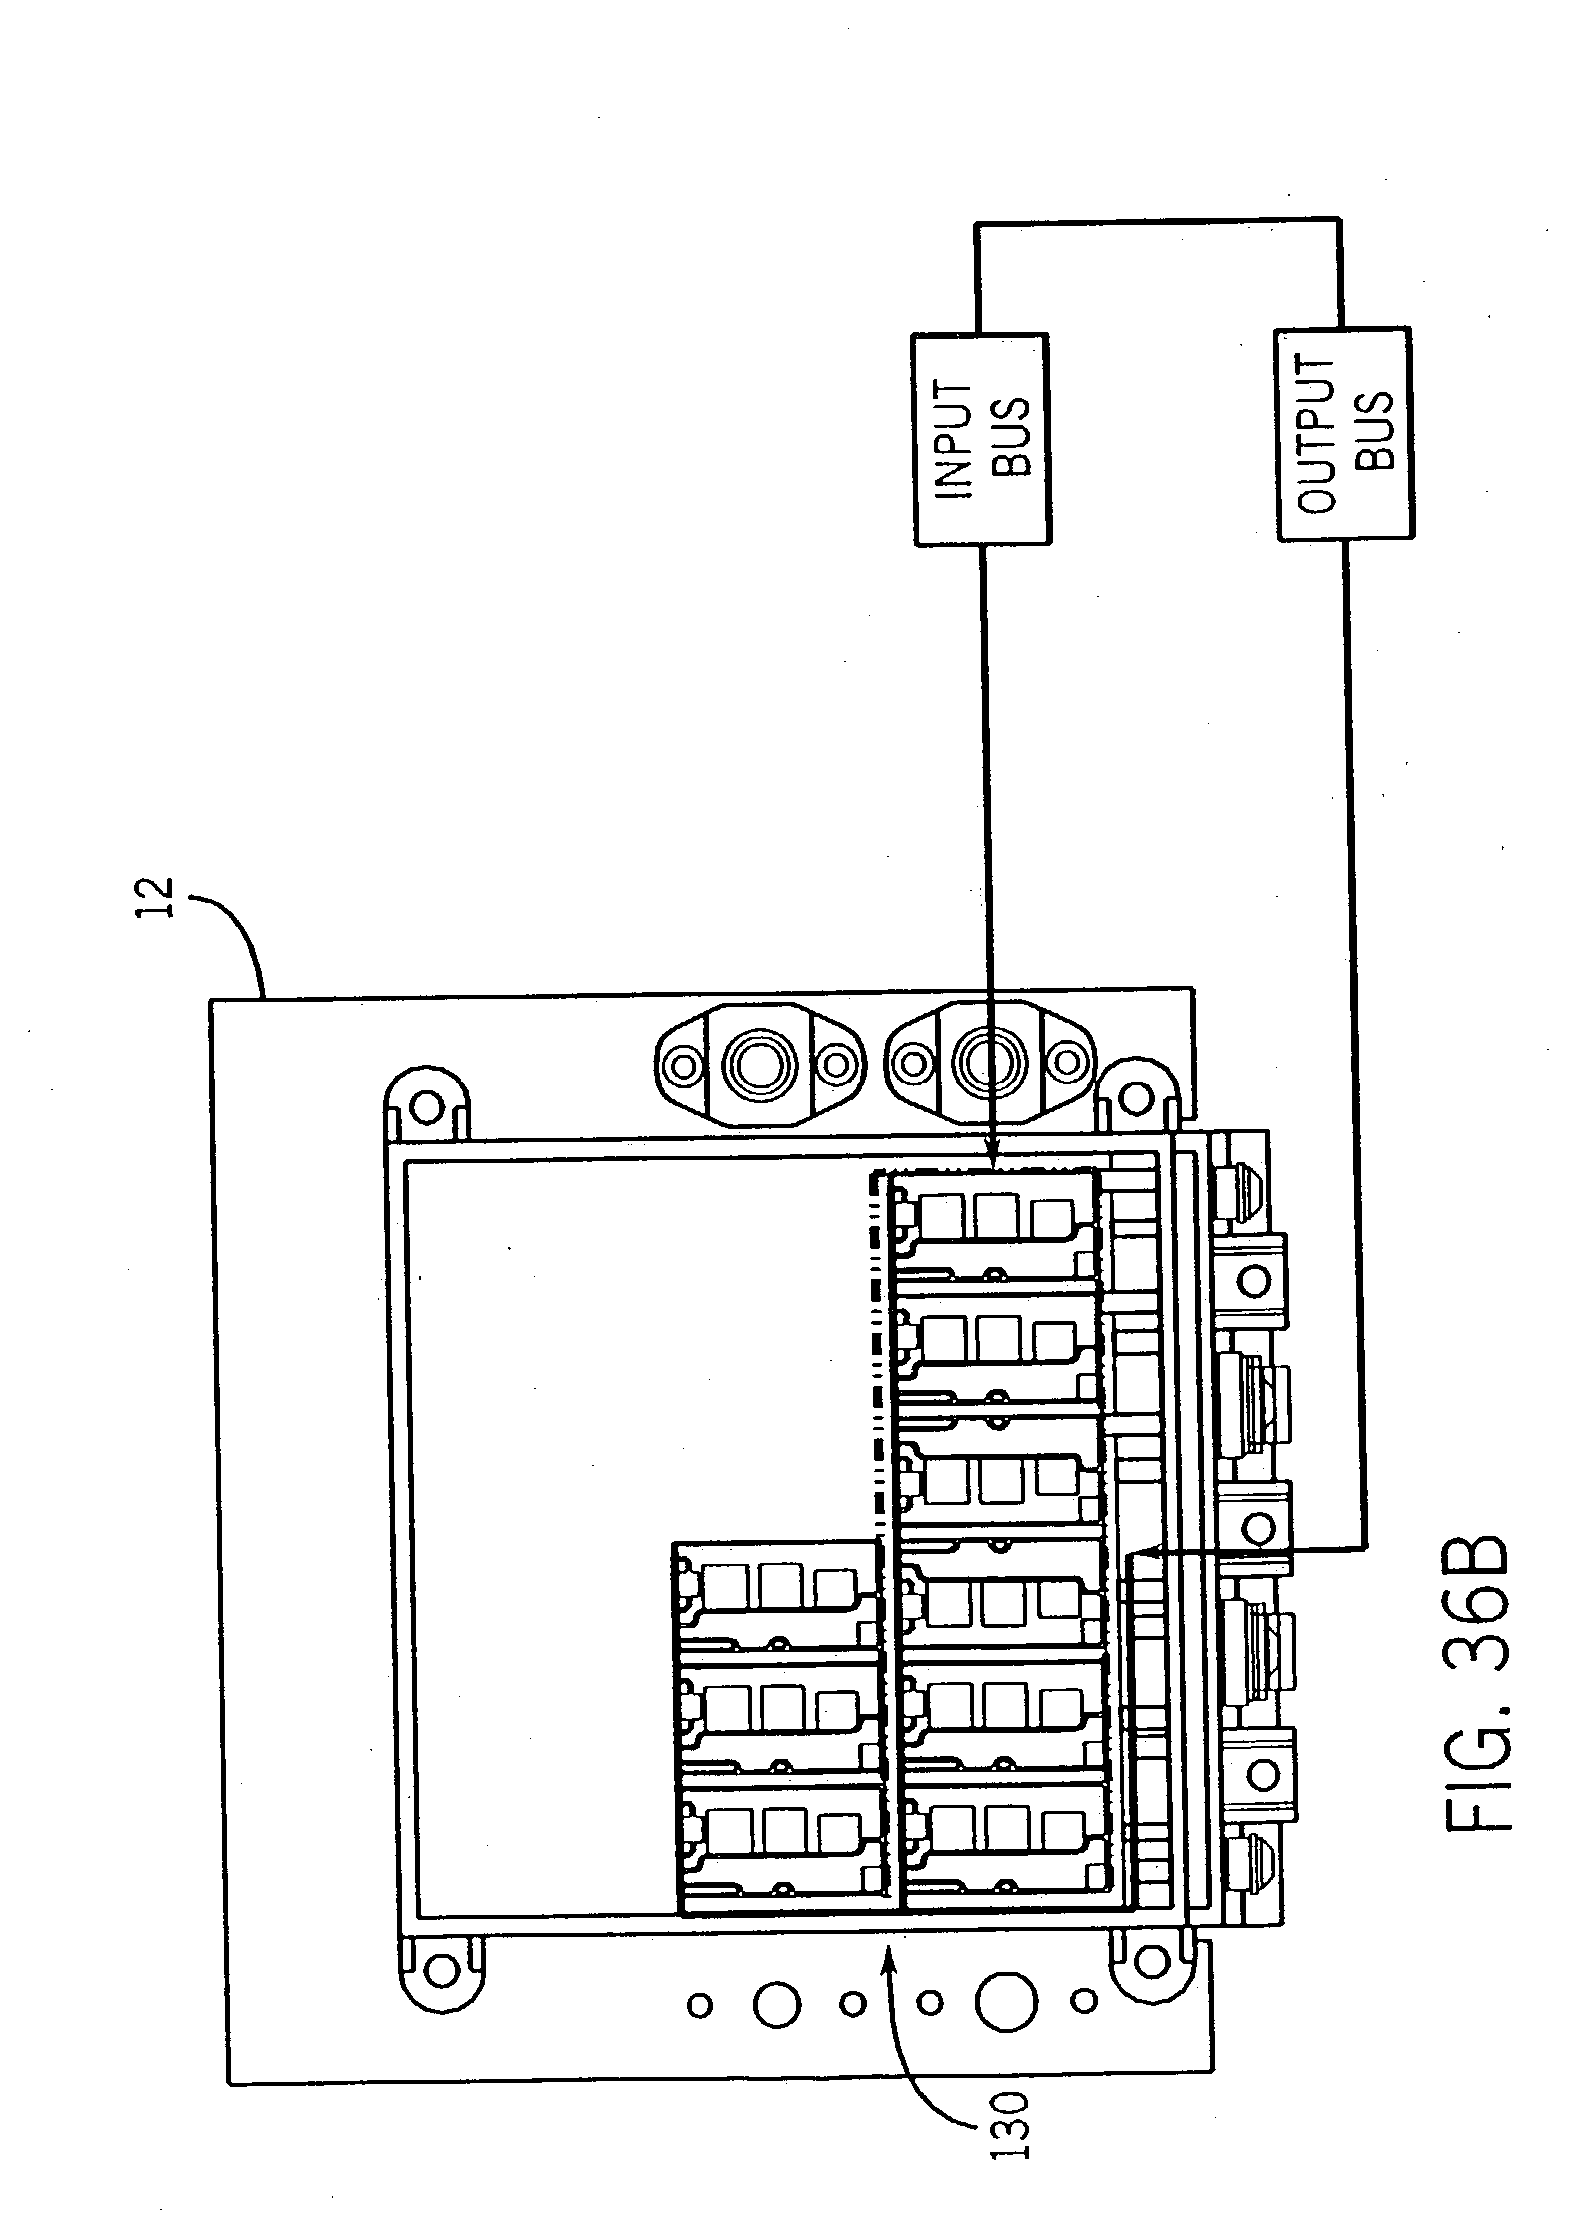 Electrical Impedance Units Images Auto Fuse Box Diagram